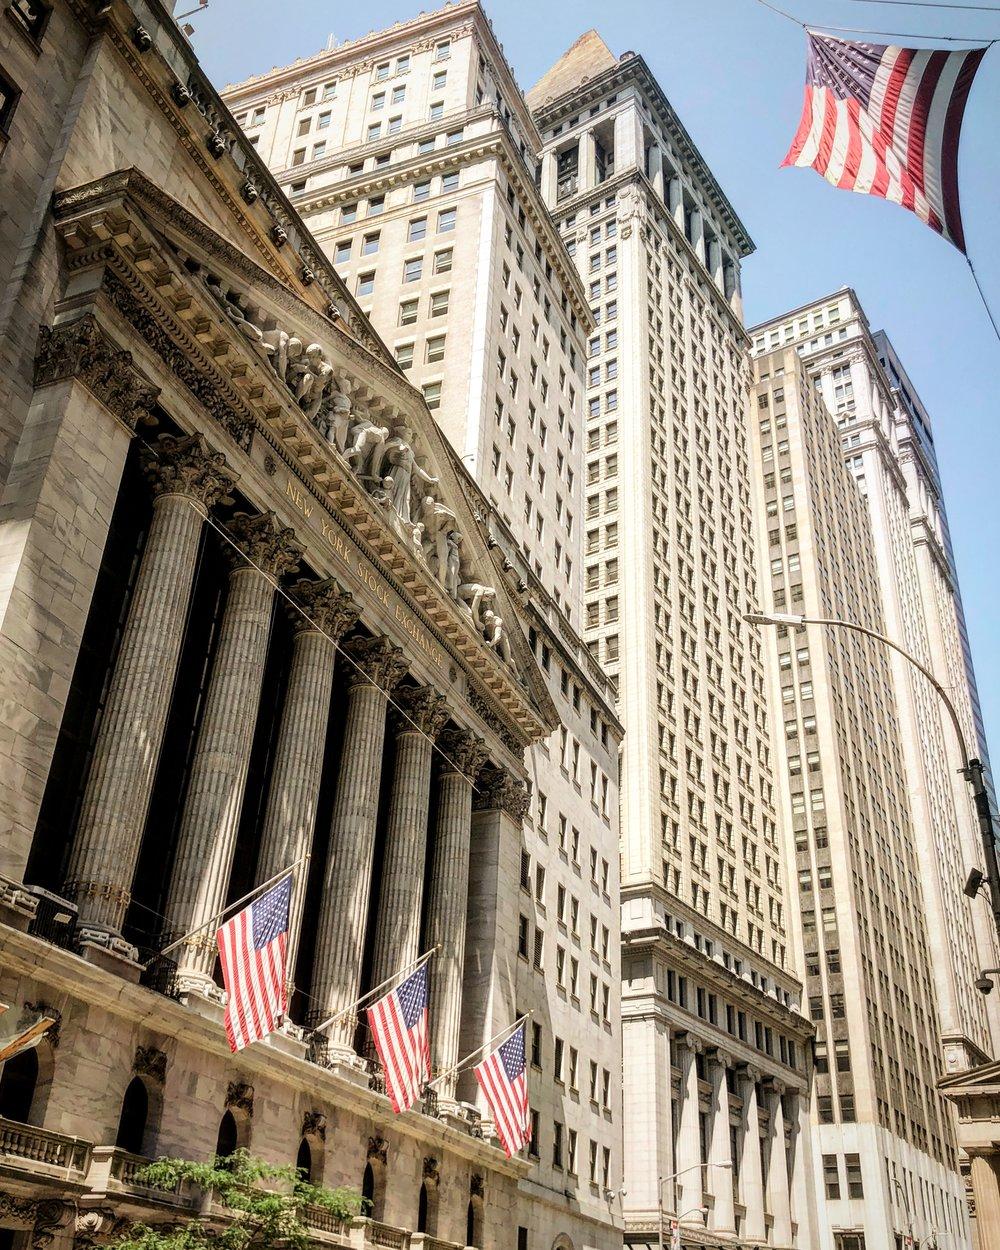 New York Stock Echange and Wall Street